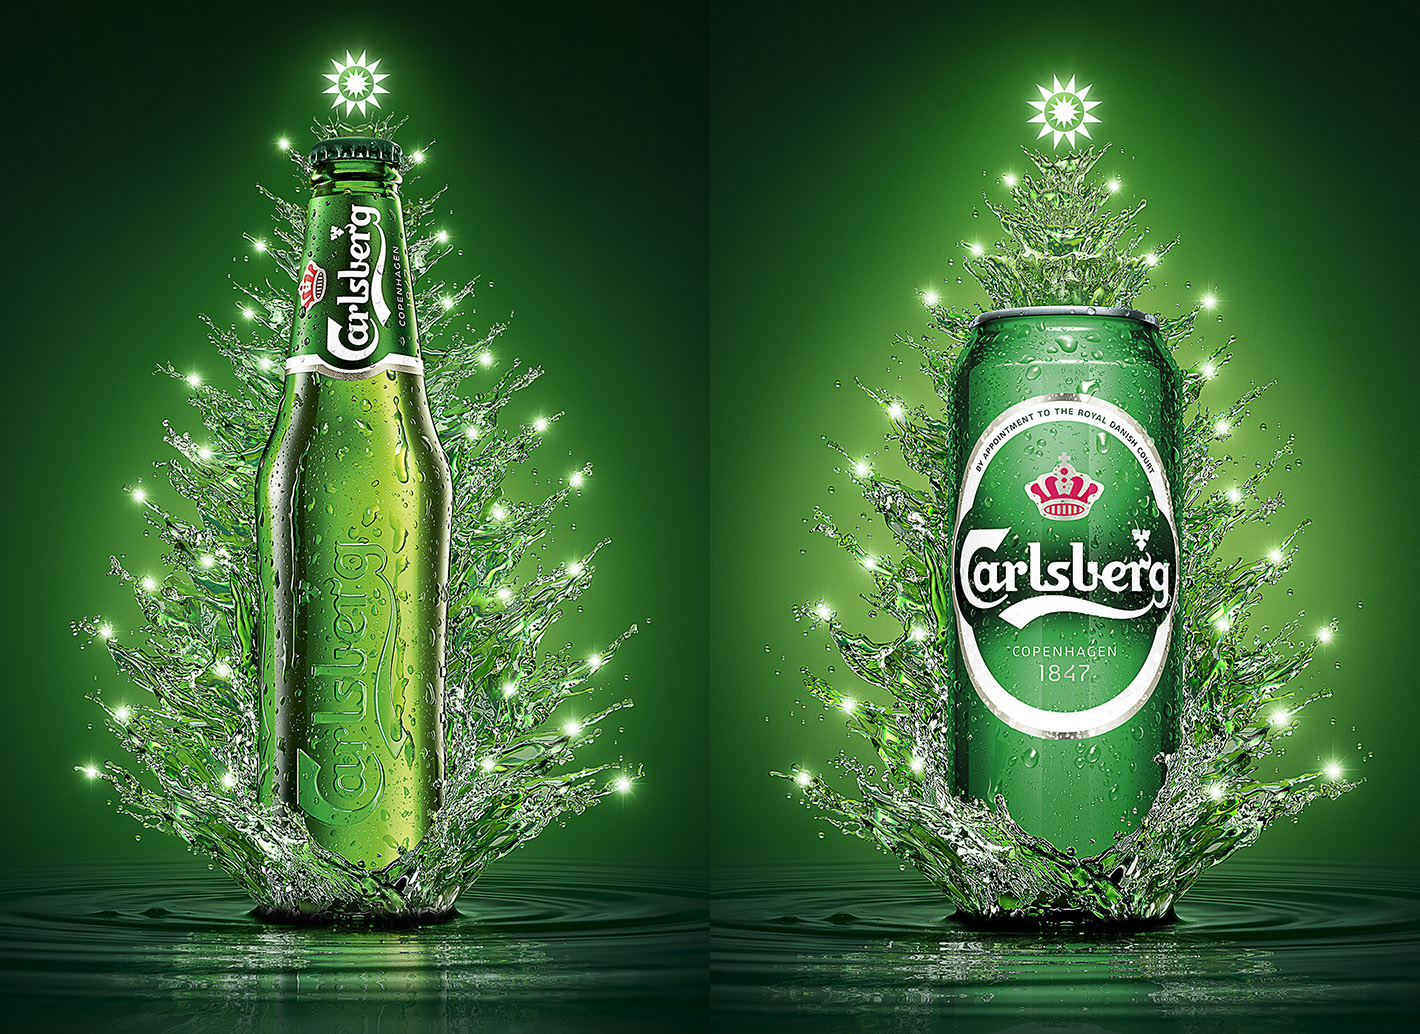 Carlsberg-CGI-1